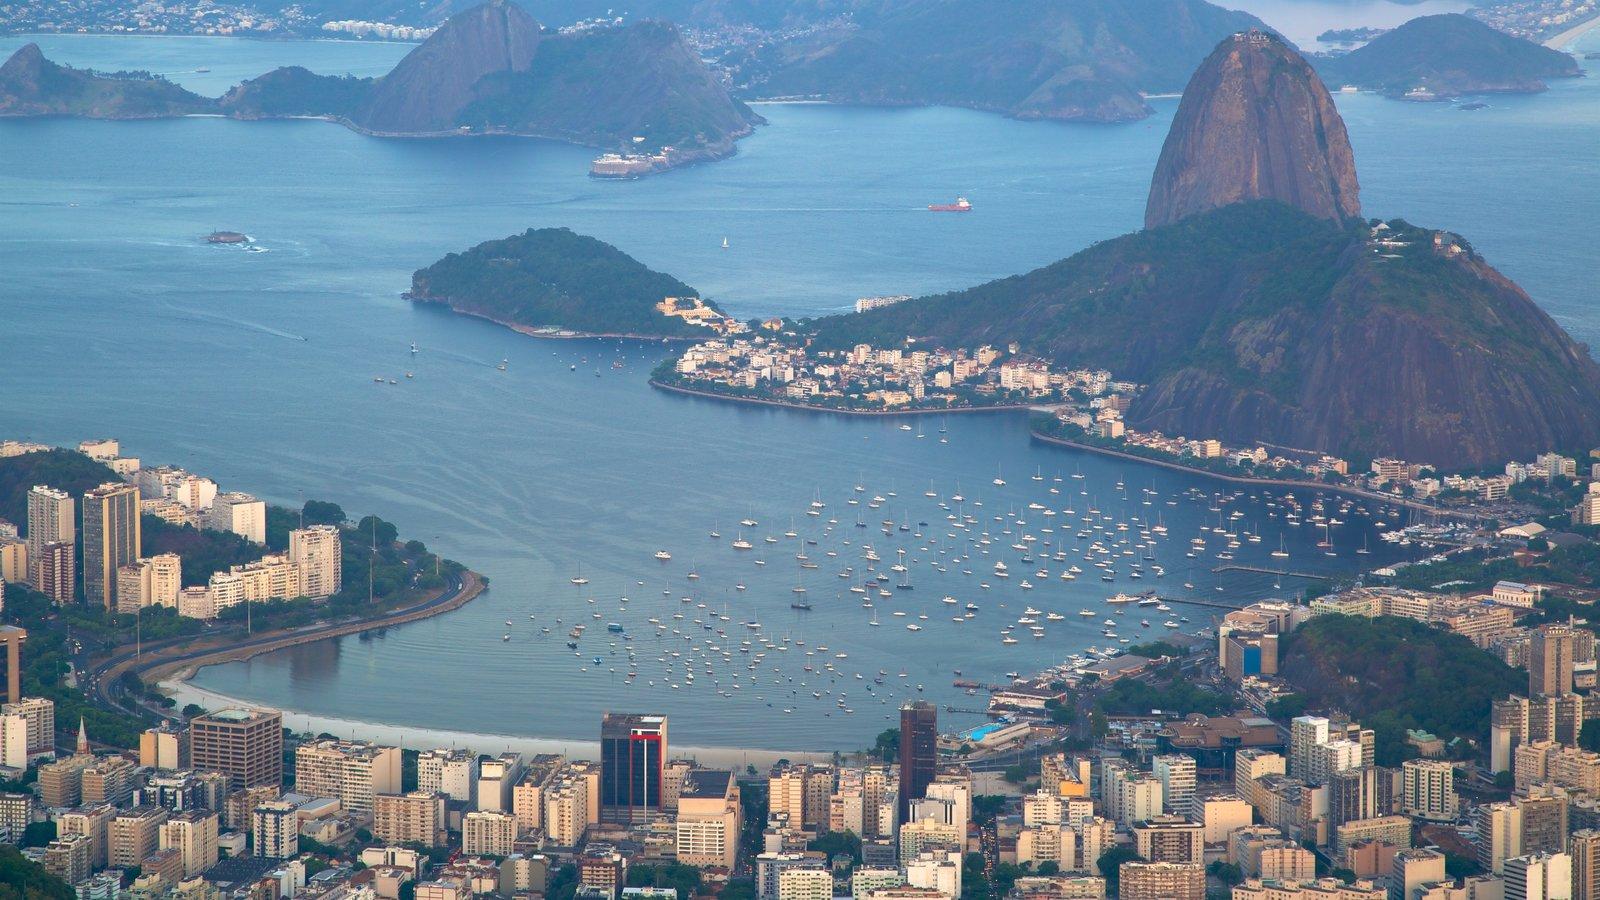 Baía de Guanabara caracterizando uma cidade, paisagem e uma baía ou porto